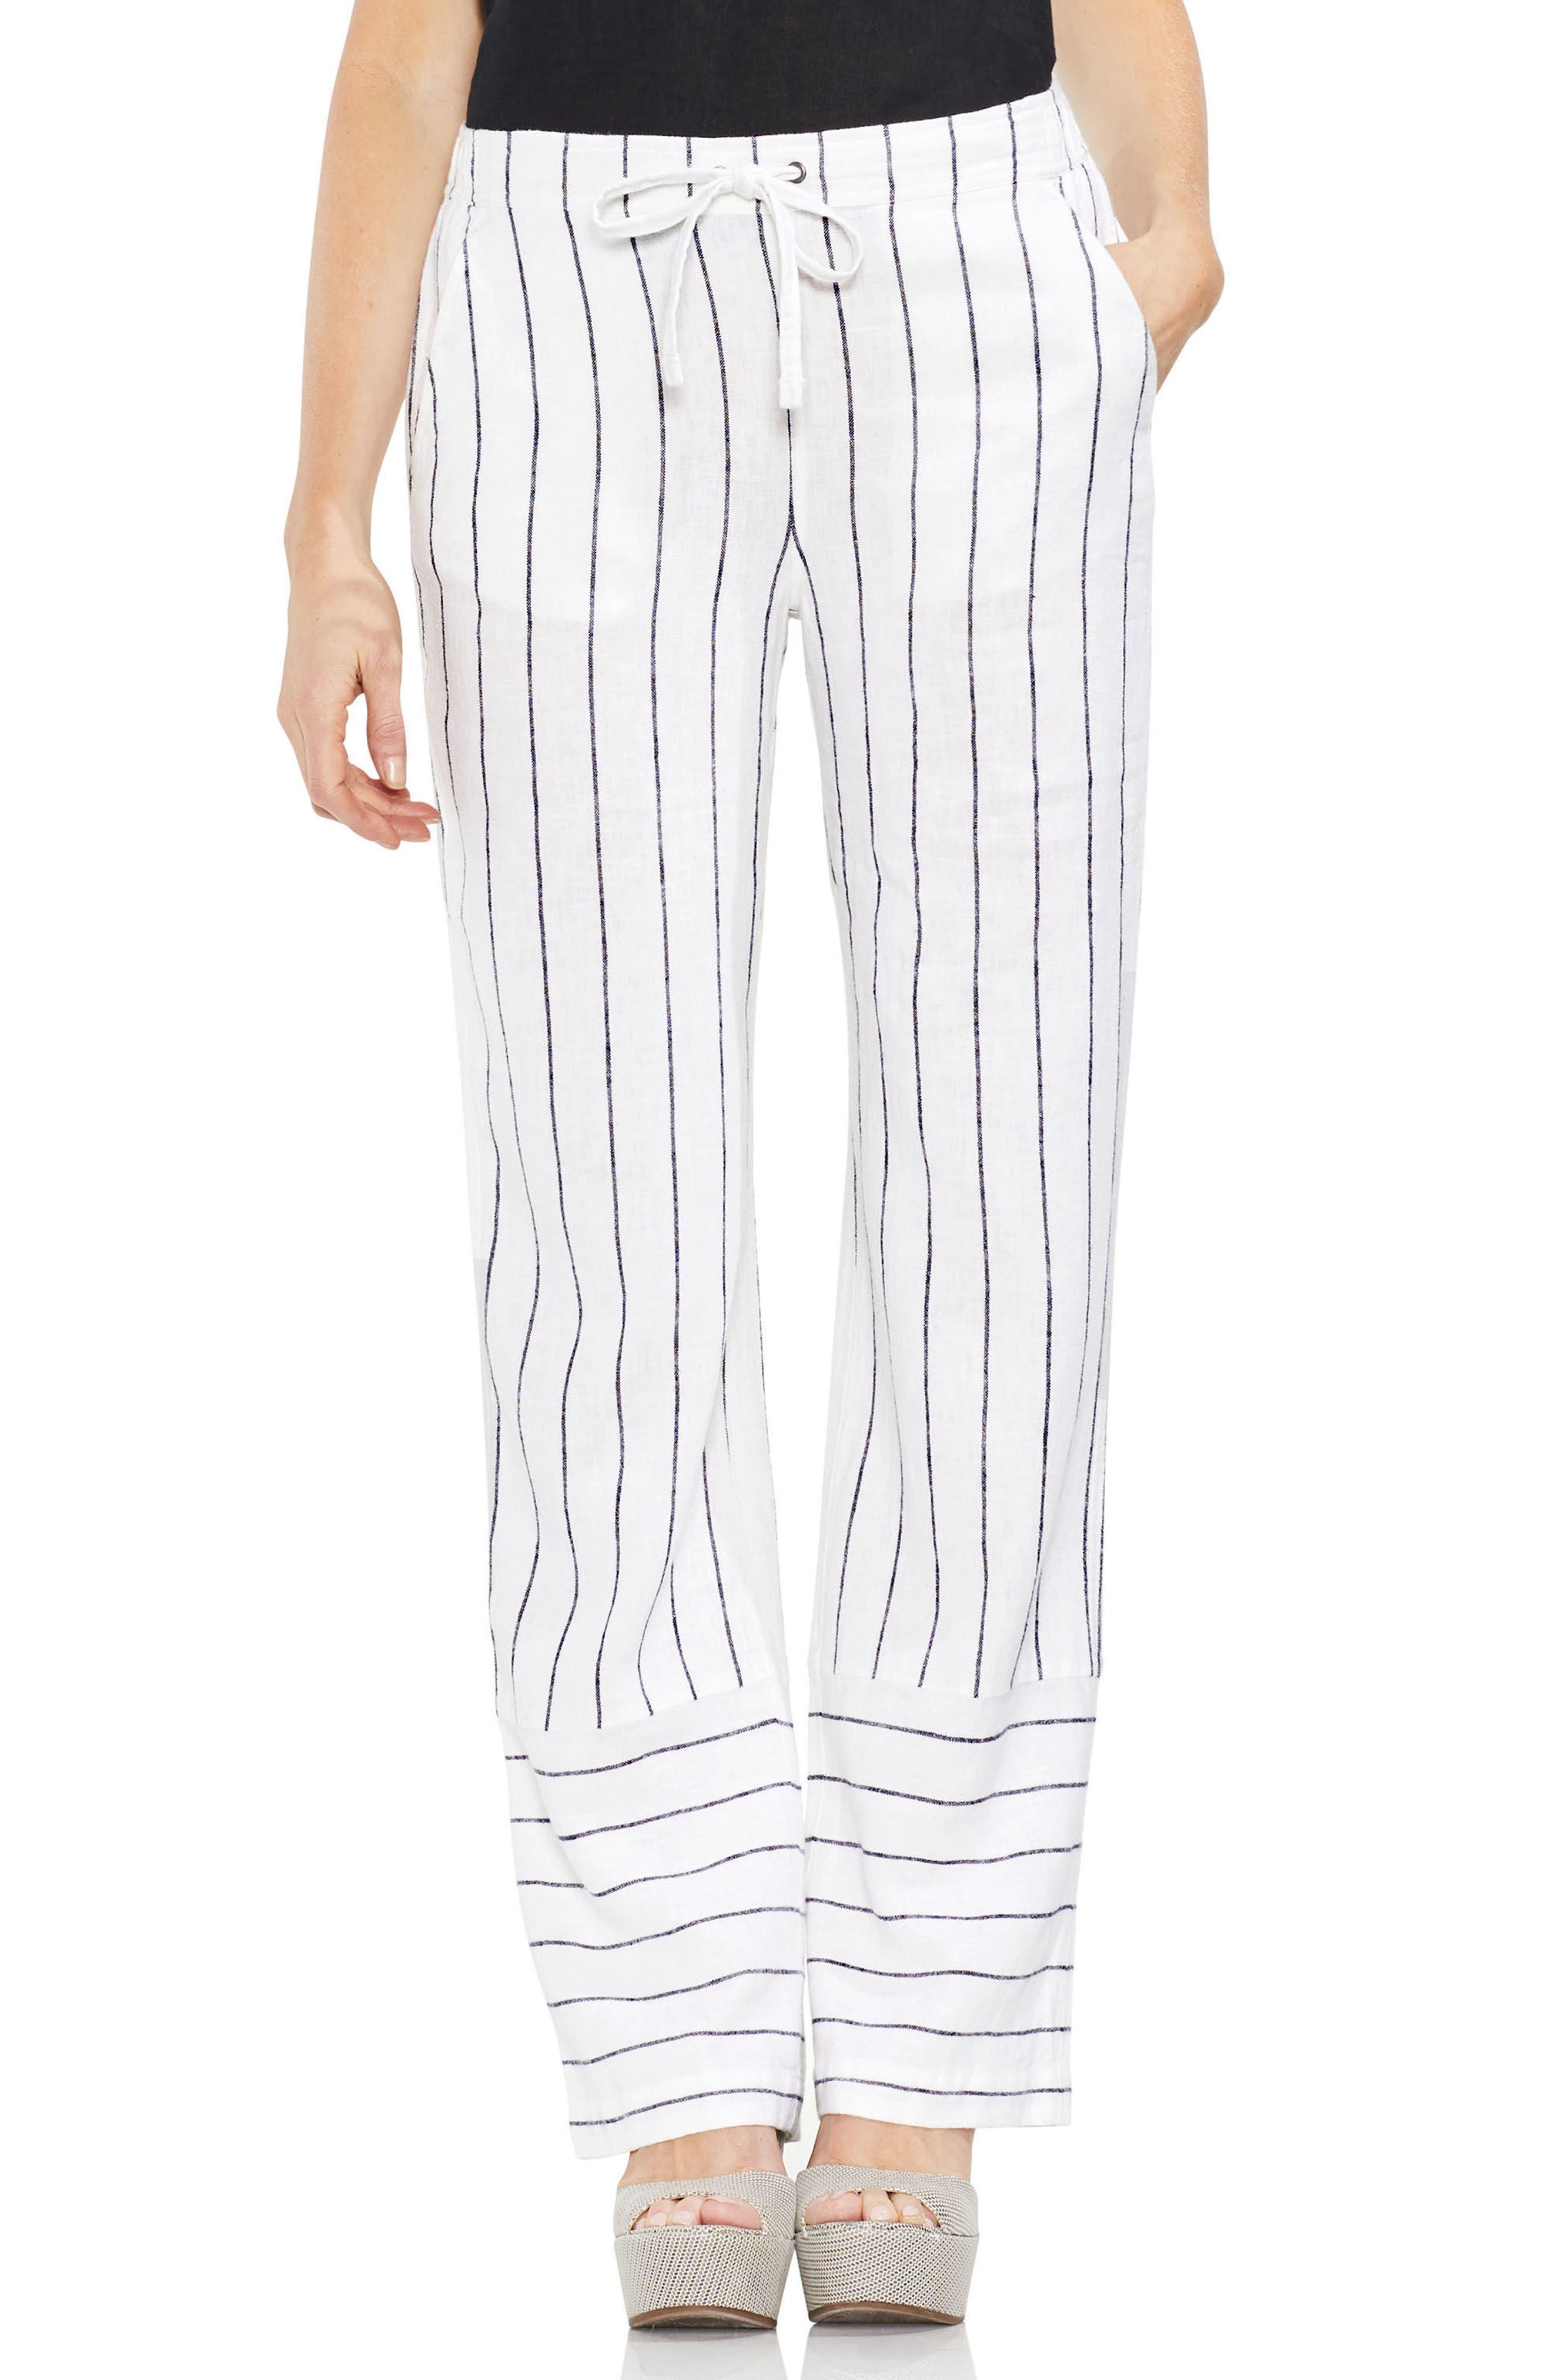 Main Image - Vince Camuto Pinstripe Linen Blend Drawstring Pants